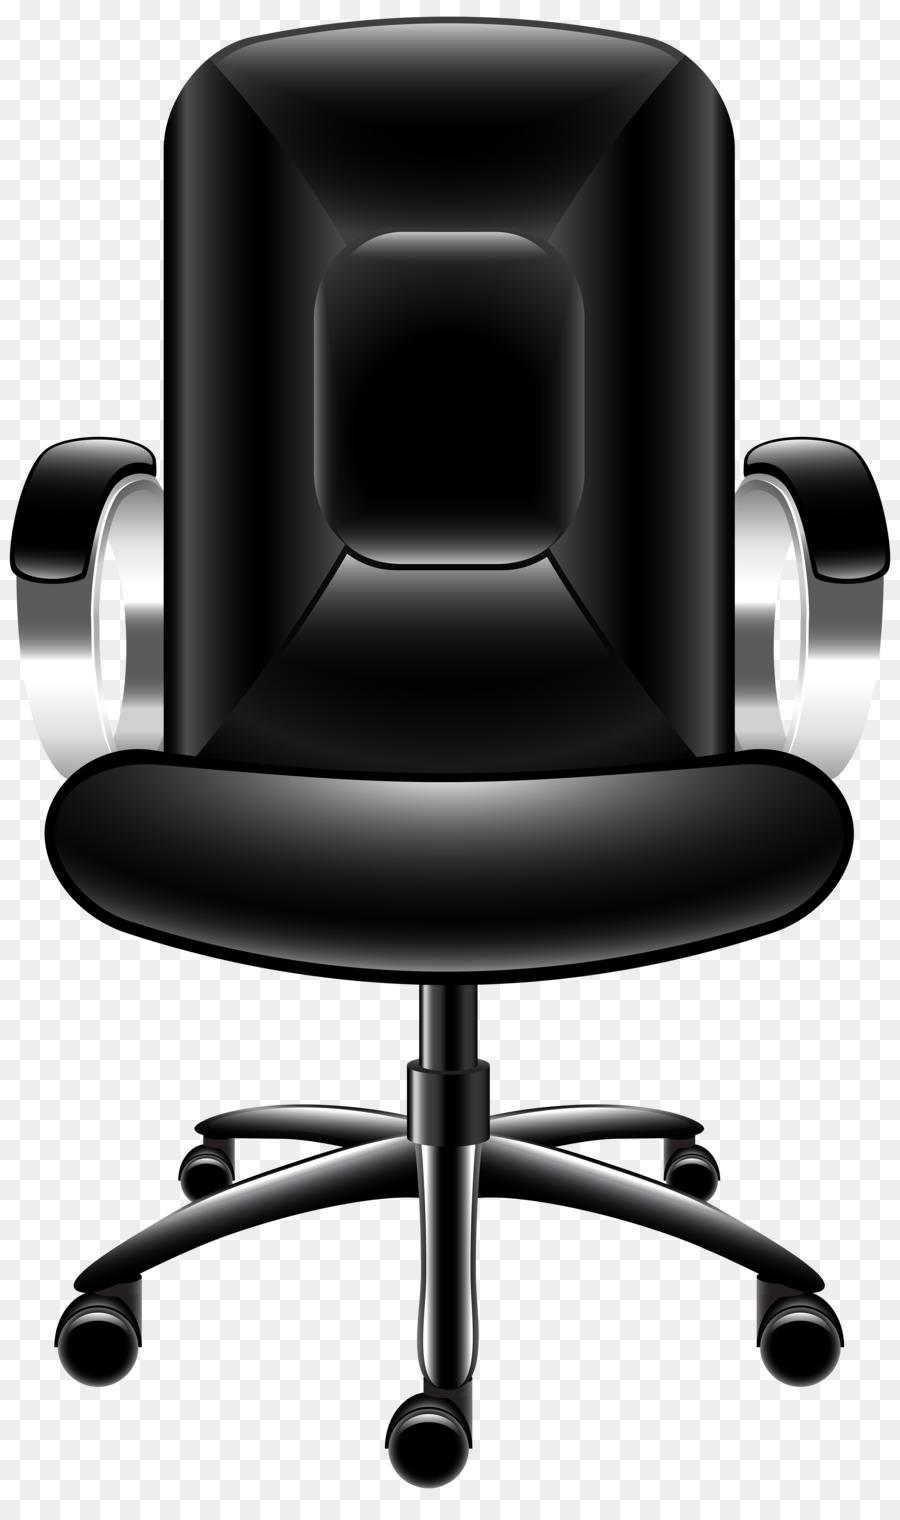 Bürostuhl clipart  Büro & Schreibtisch-Stühle-Möbel-clipart - Bürostuhl cliparts png ...